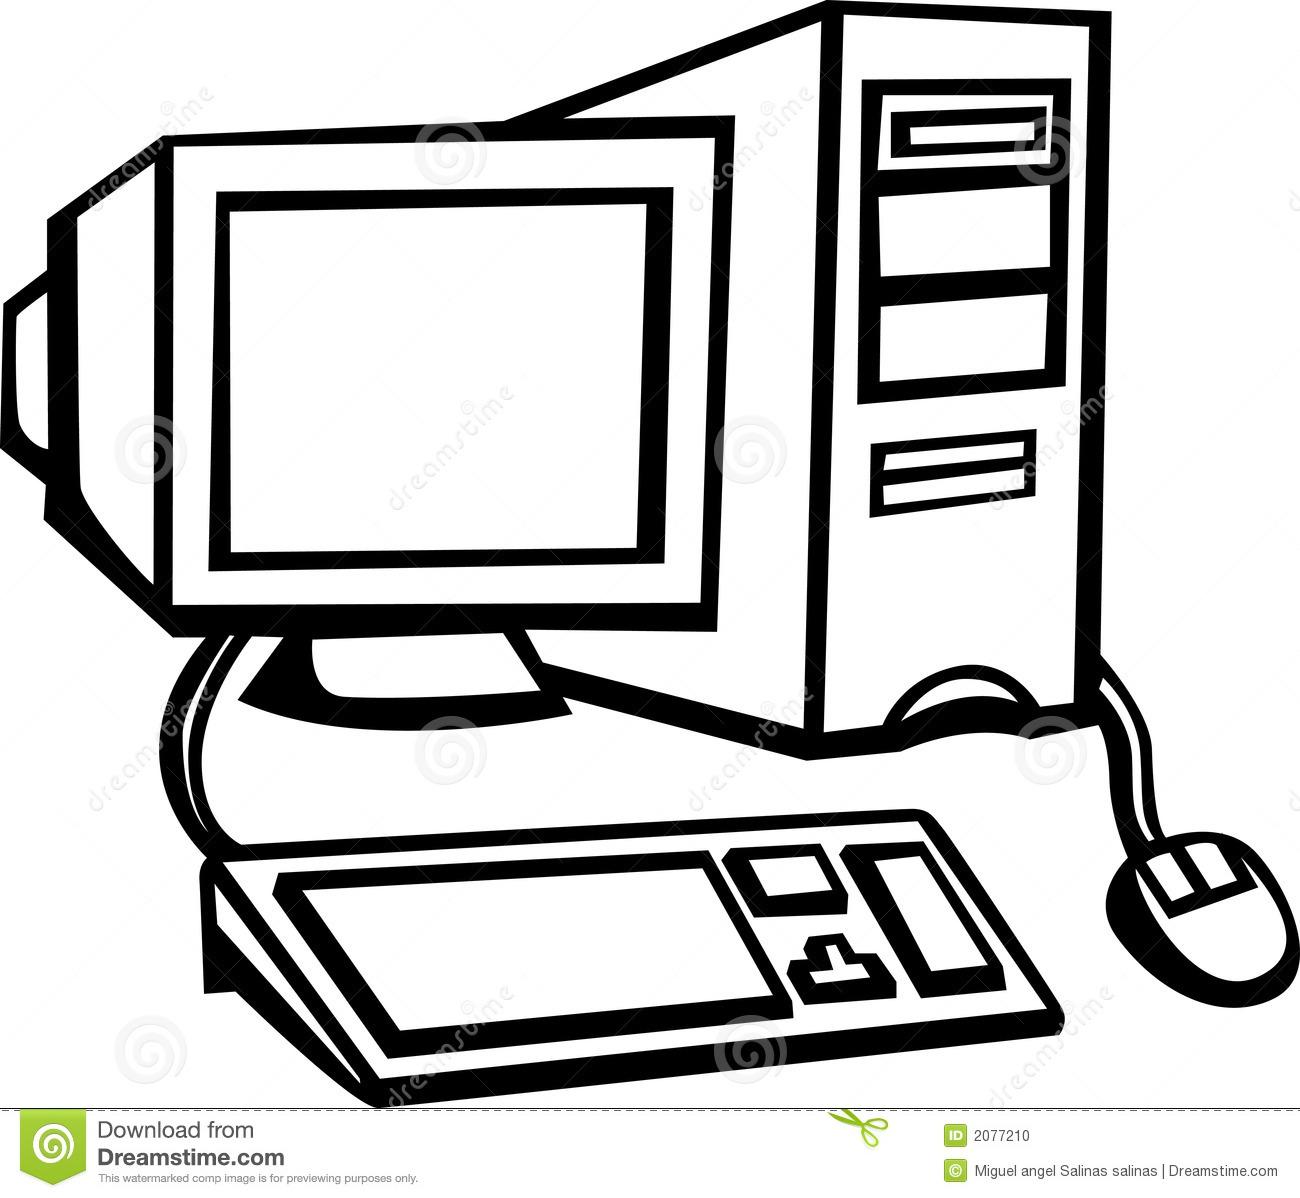 Desktop computer system clipart.